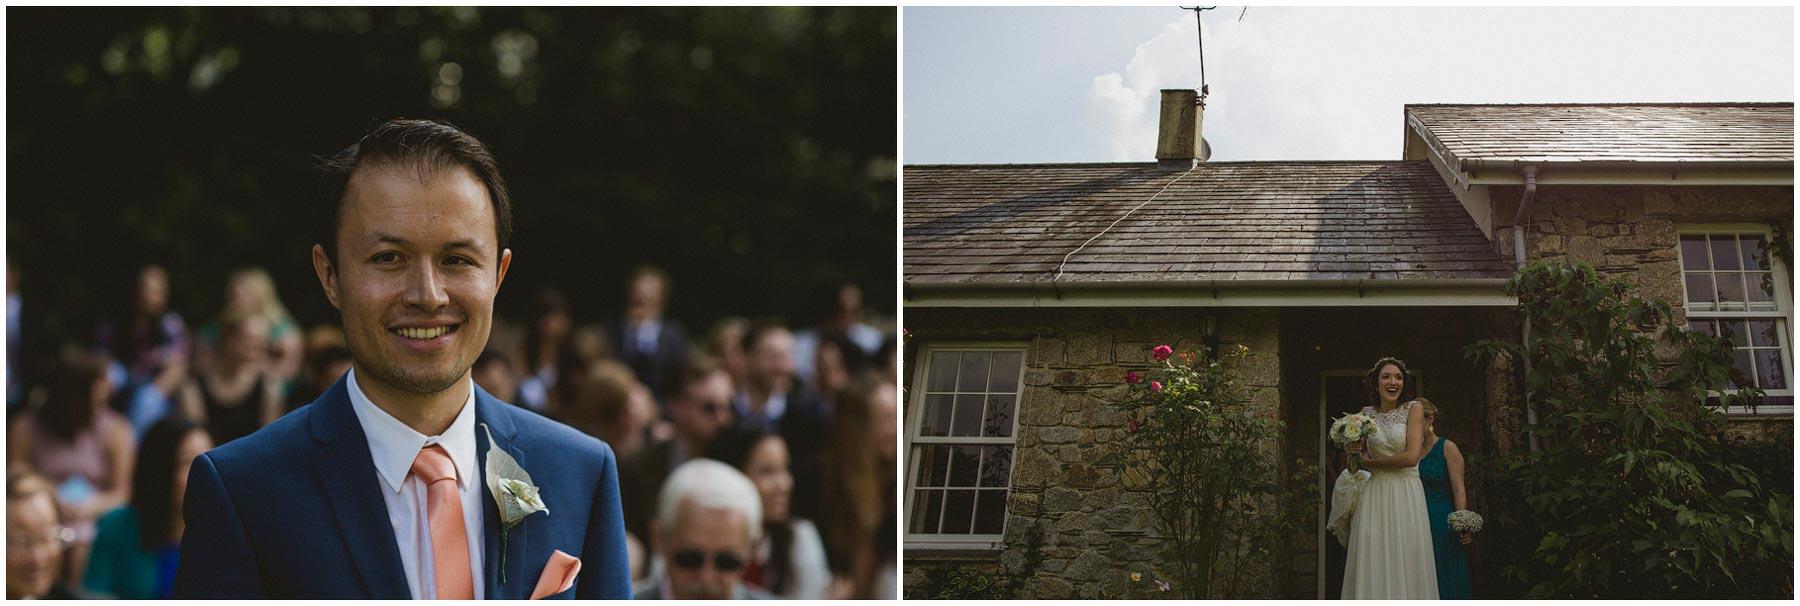 Colehayes-Park-Wedding-Photography_0062